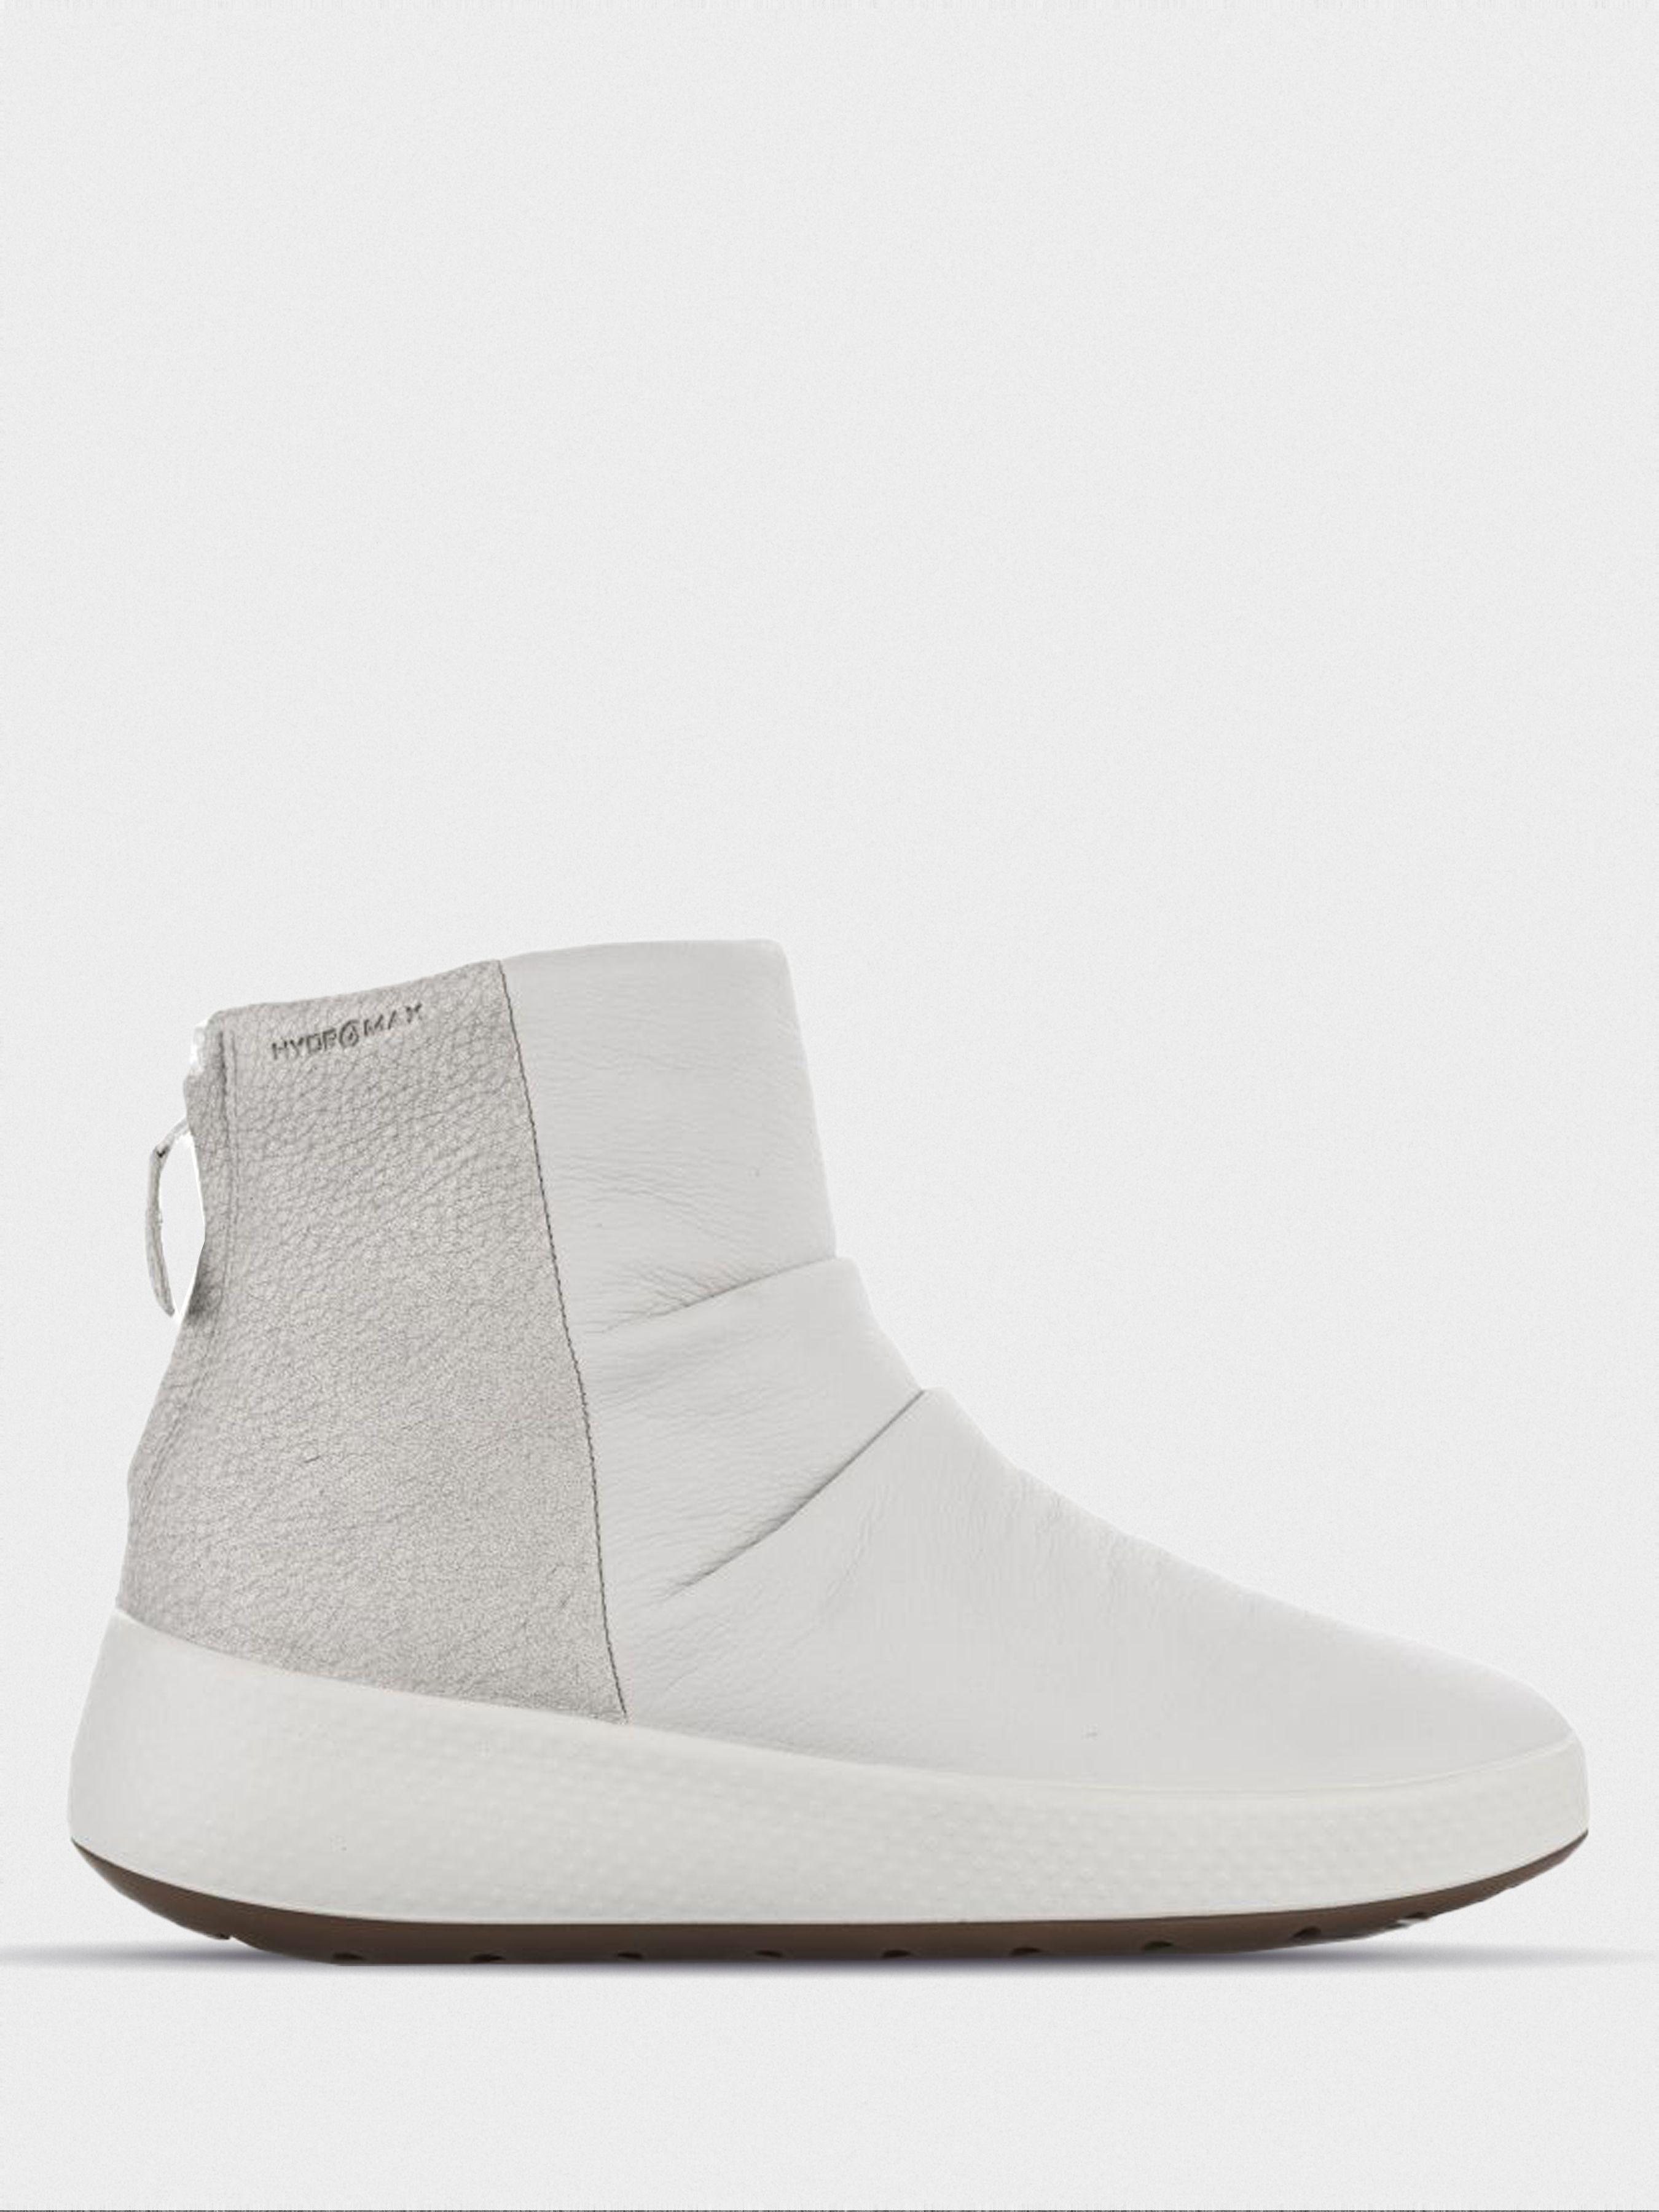 Ботинки для женщин ECCO UKIUK ZW6081 продажа, 2017